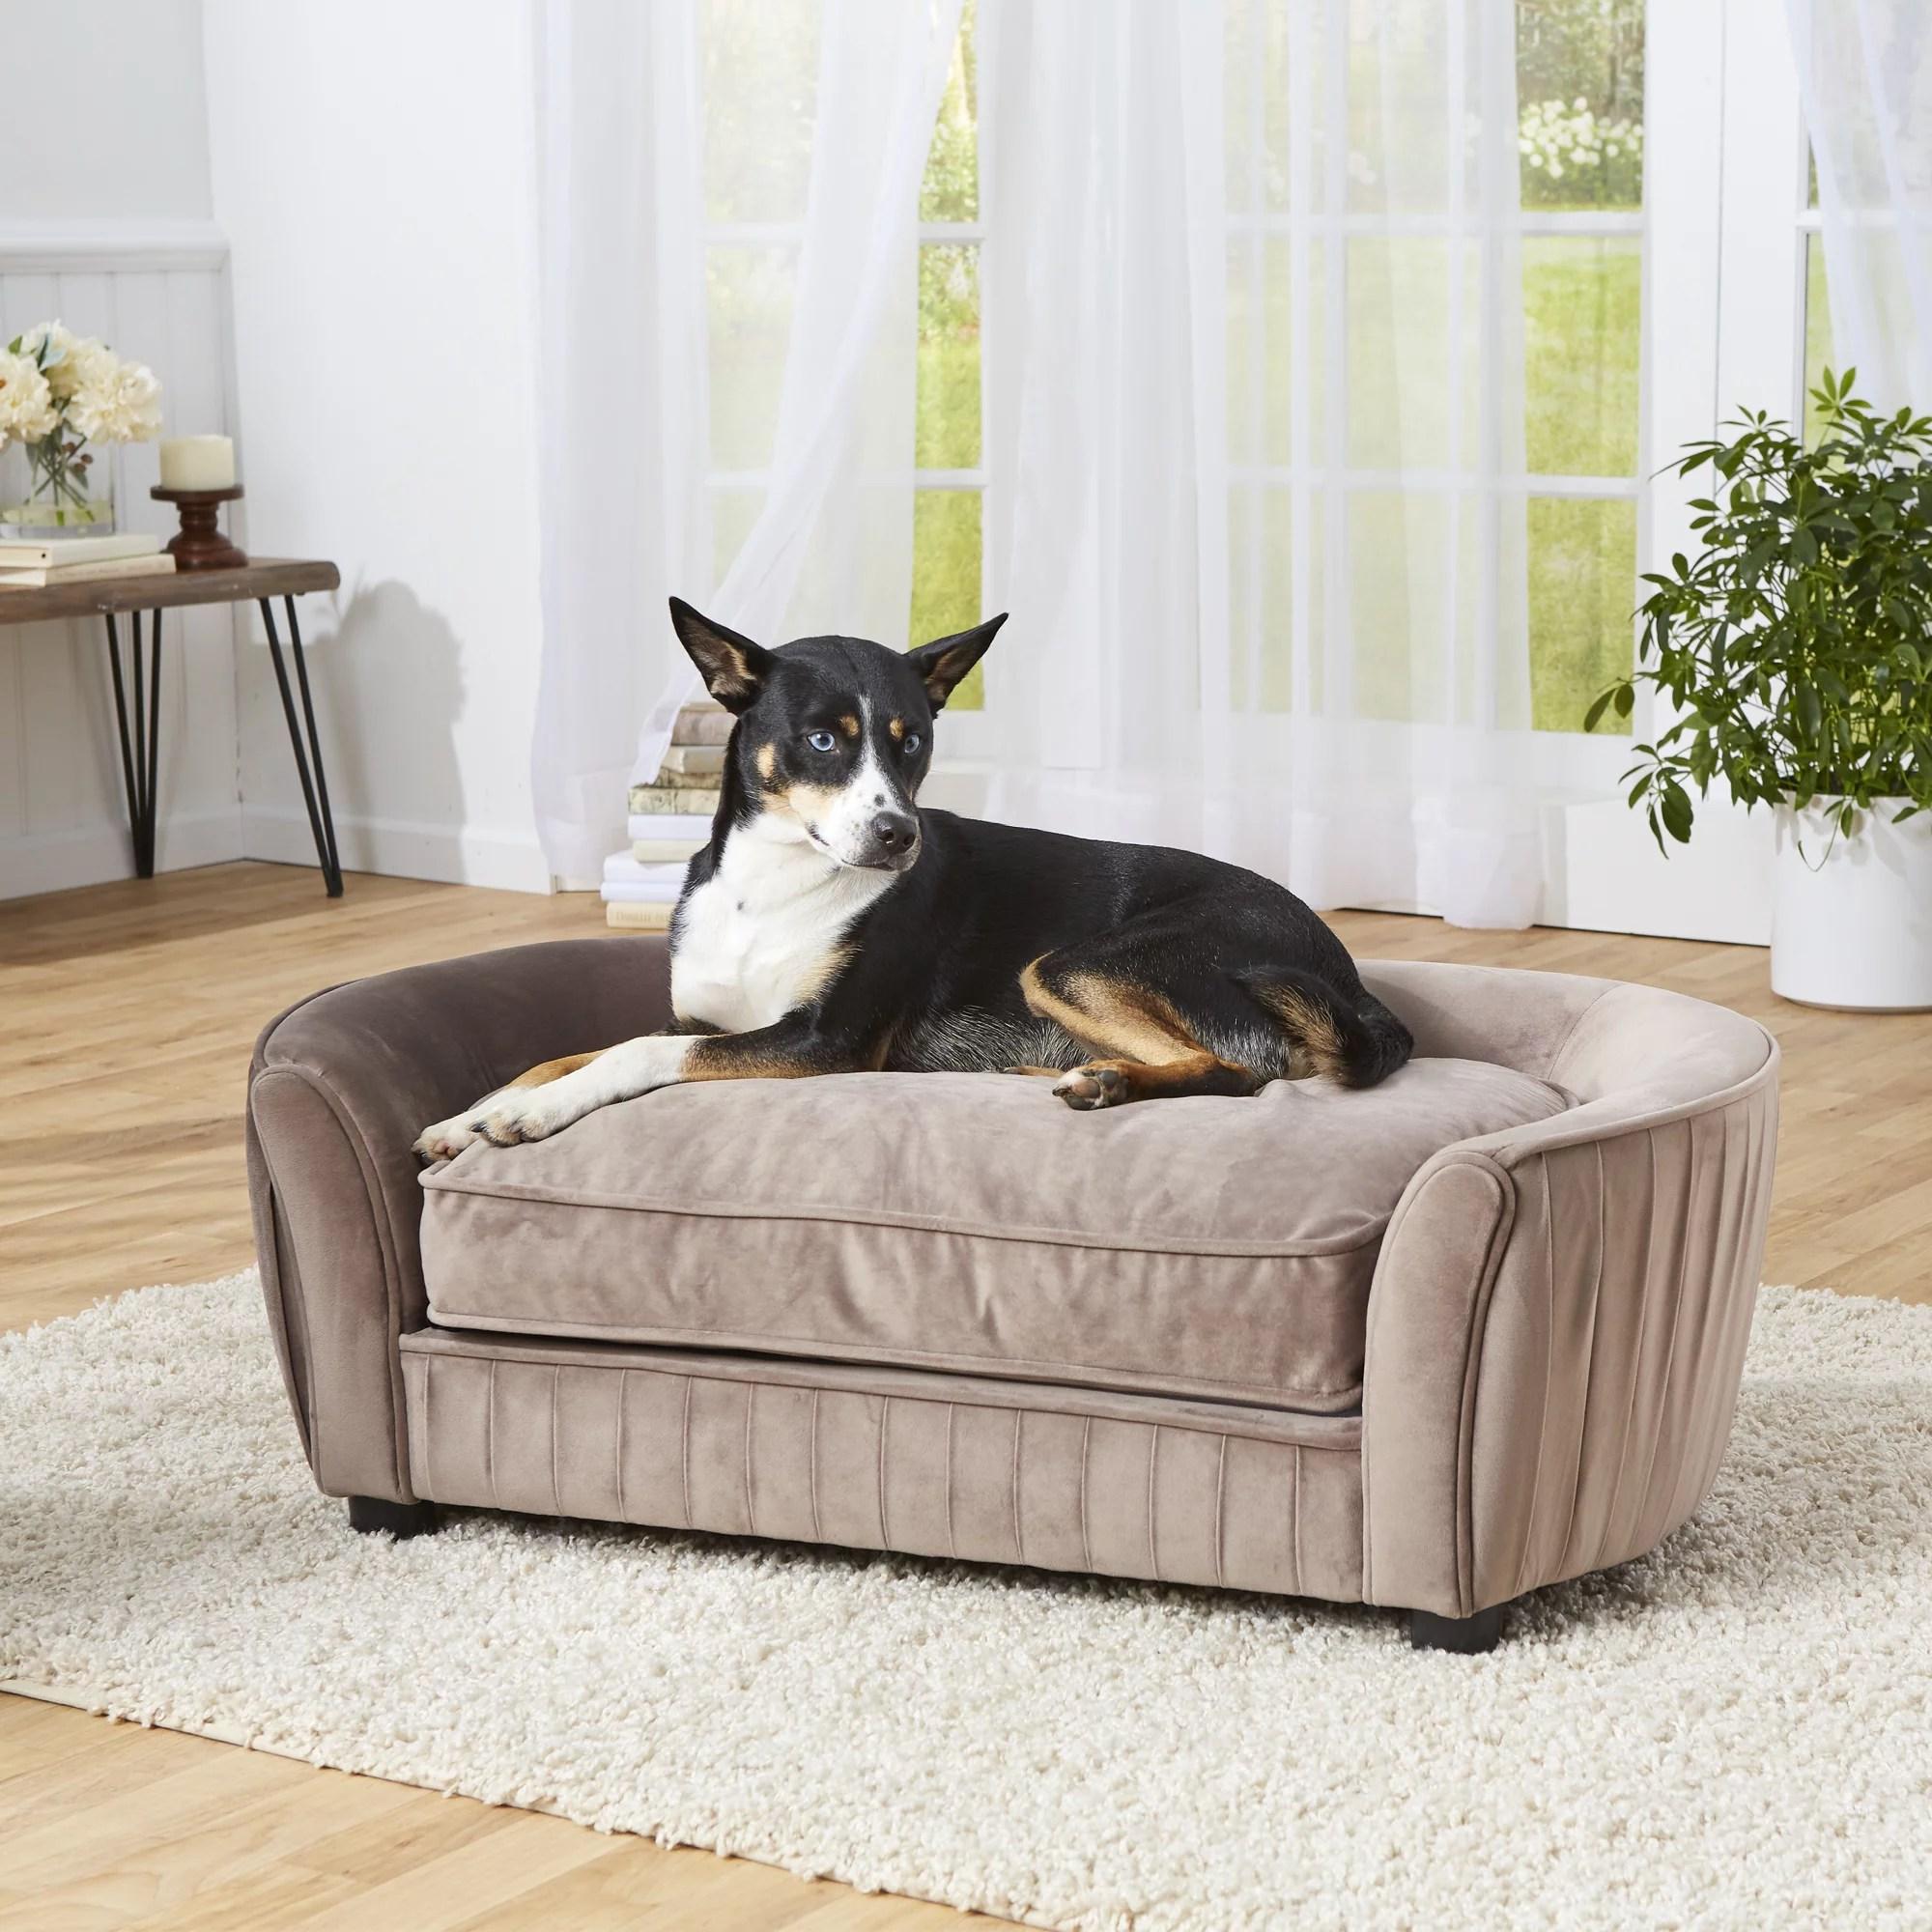 enchanted home mackenzie pet sofa reupholstering cushions do it yourself pettucker walmart